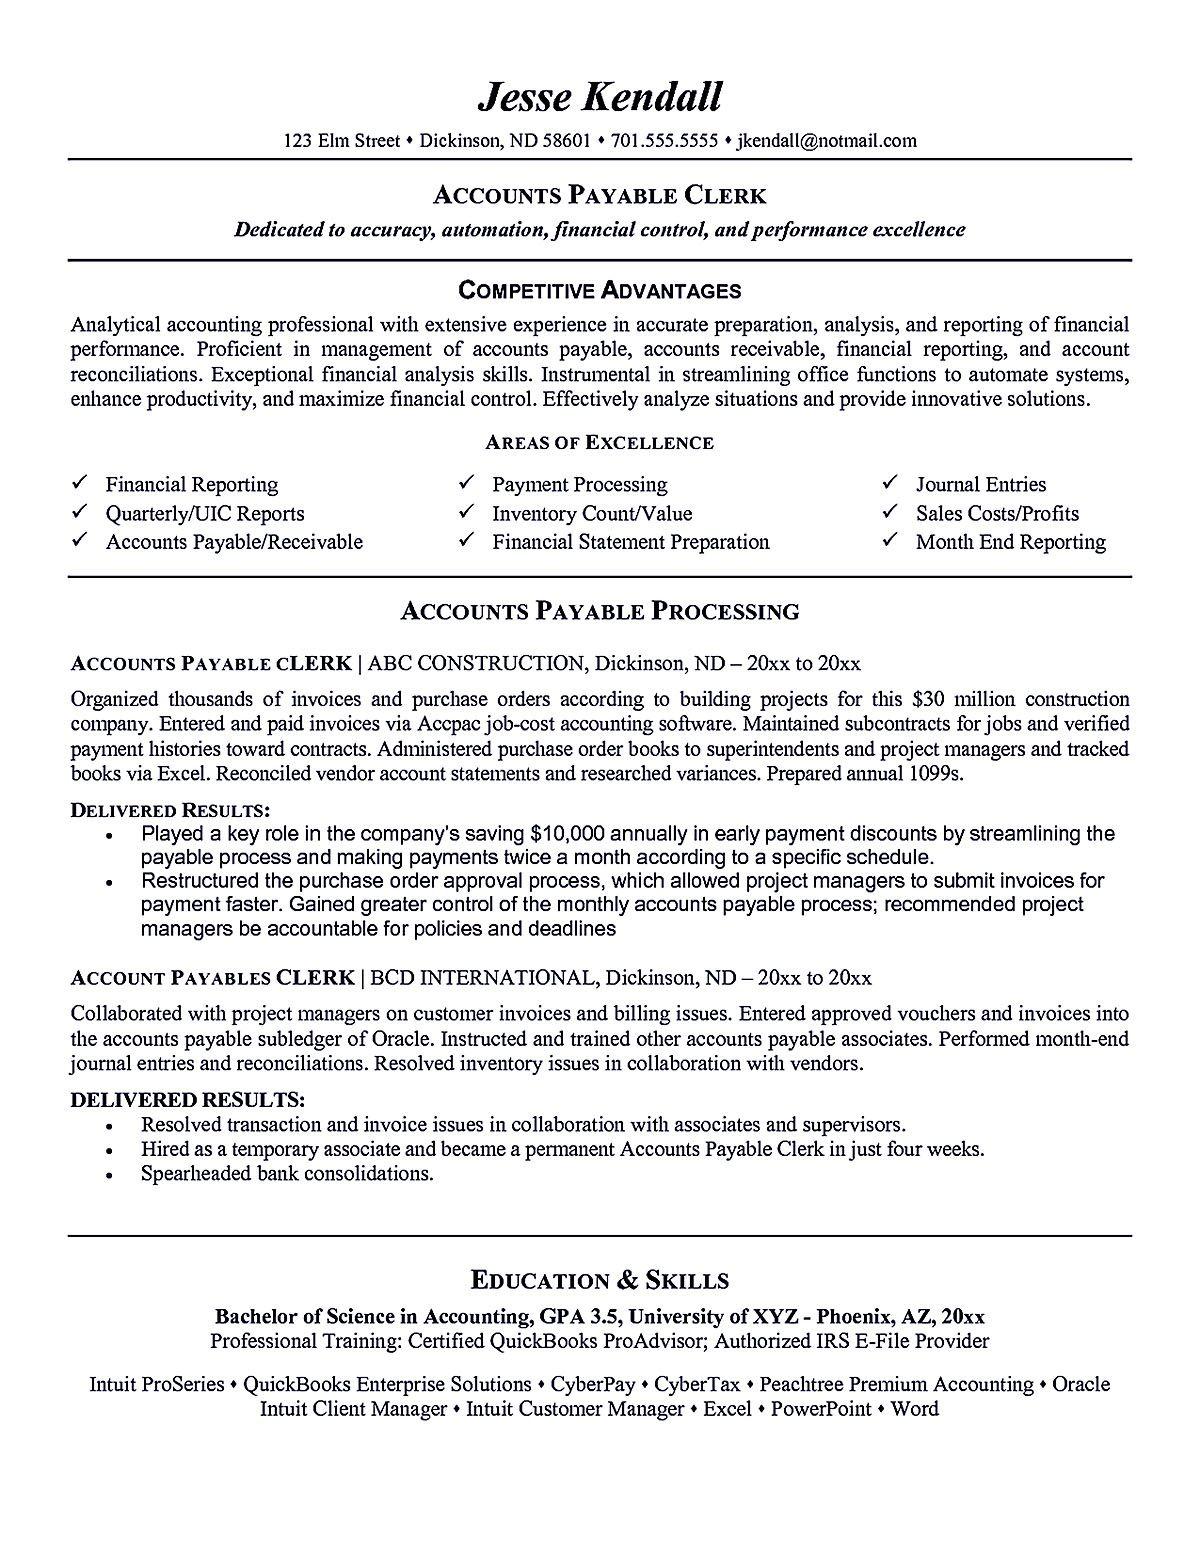 Interpersonal Skills Resume Example